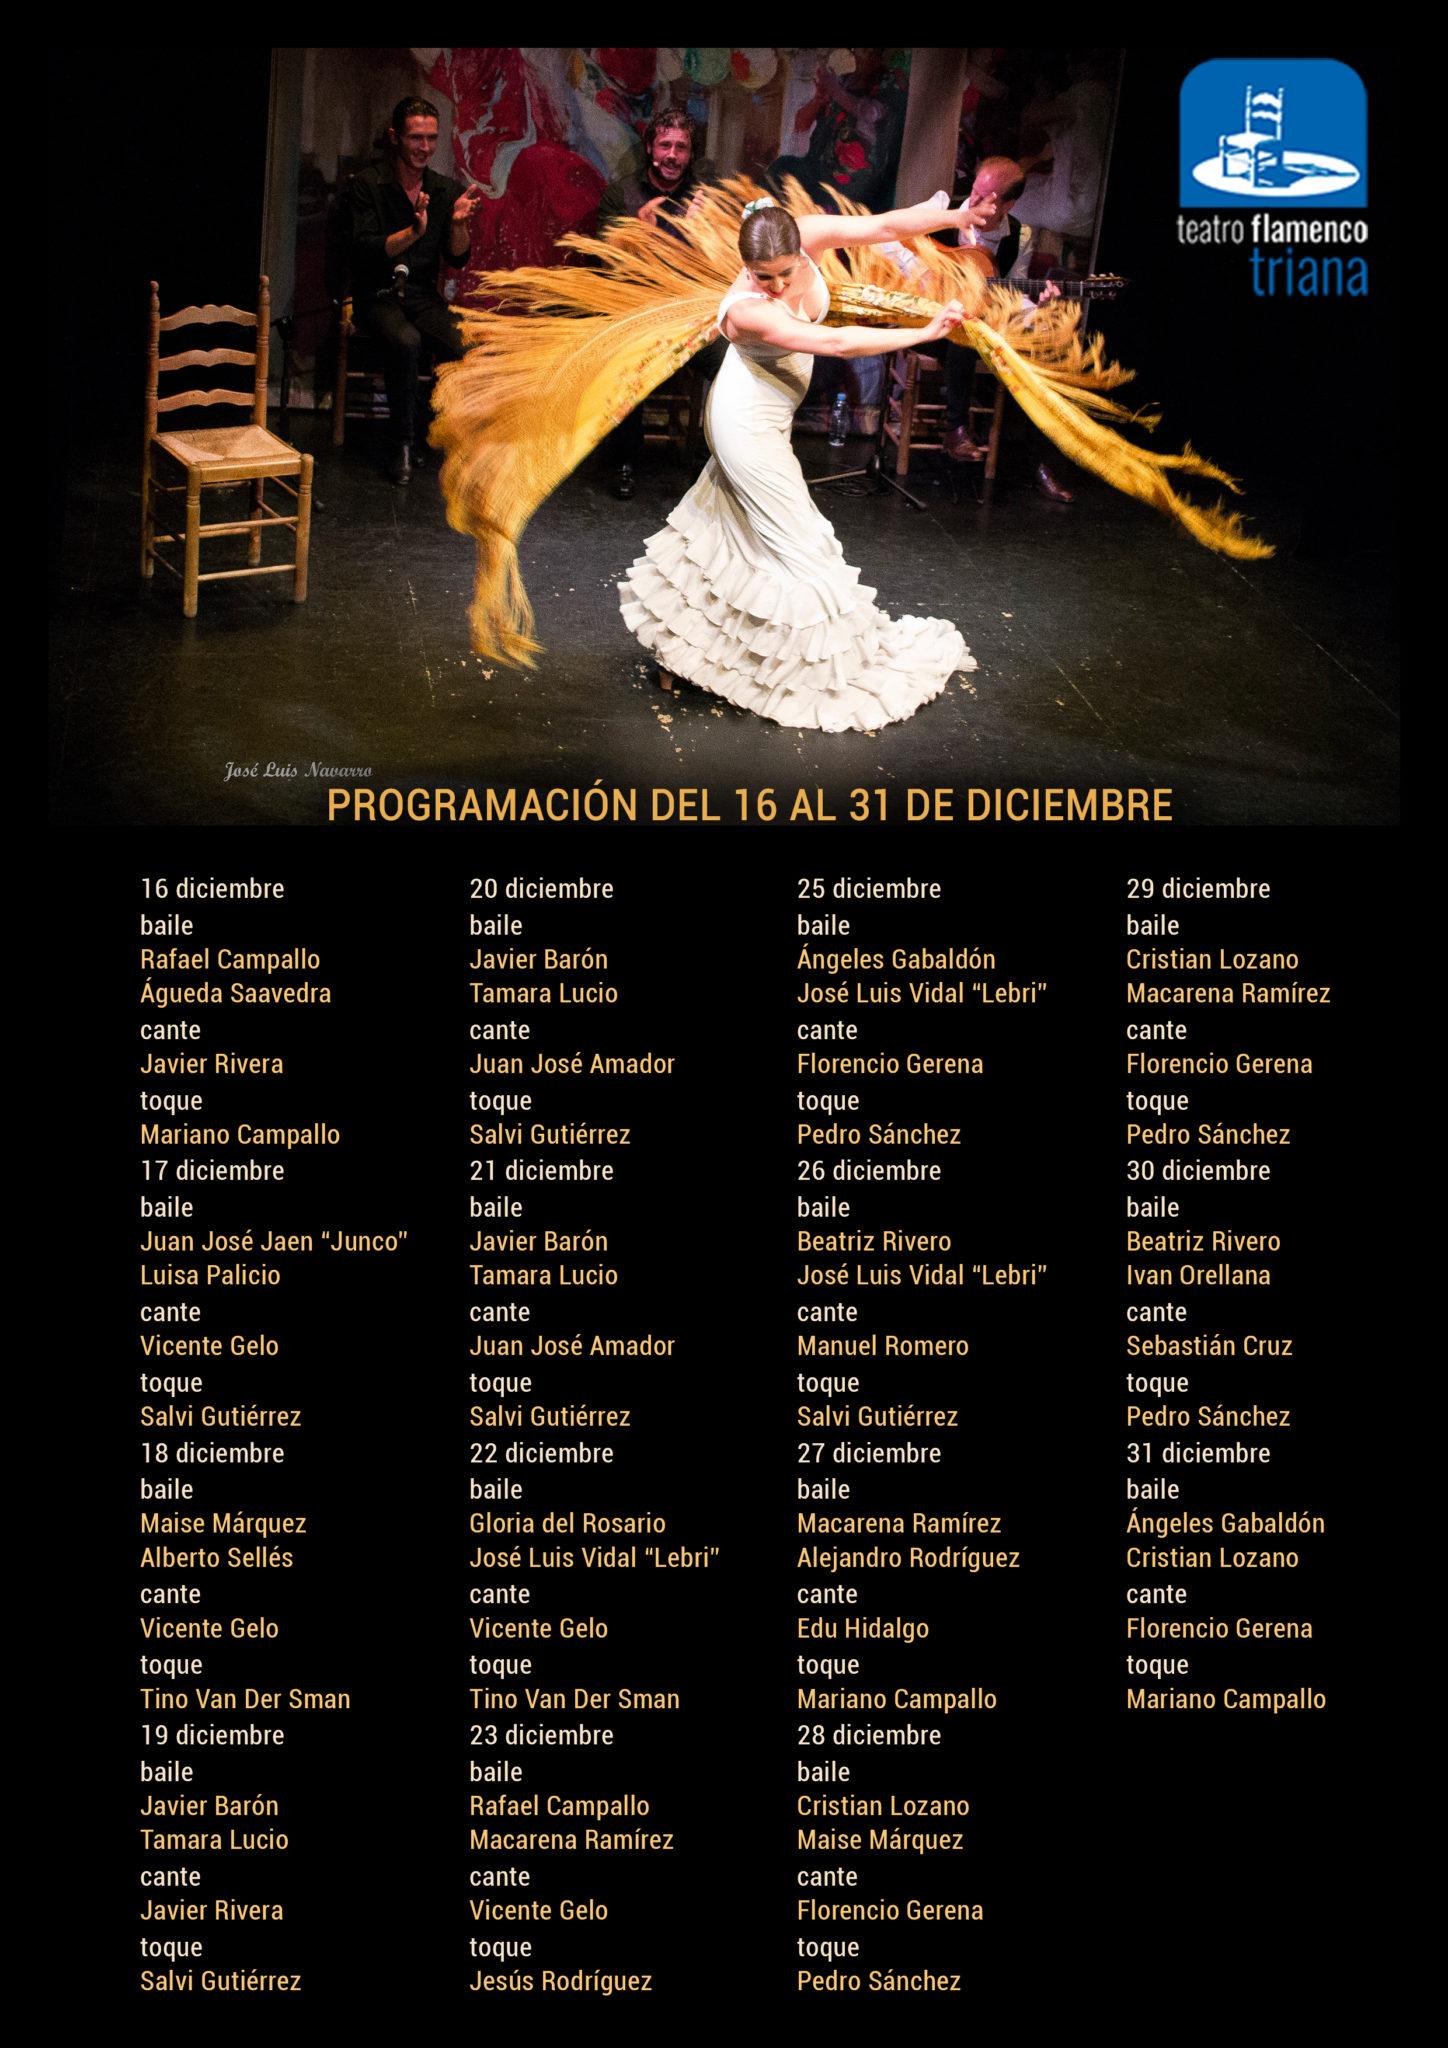 Programación Teatro Flamenco Triana